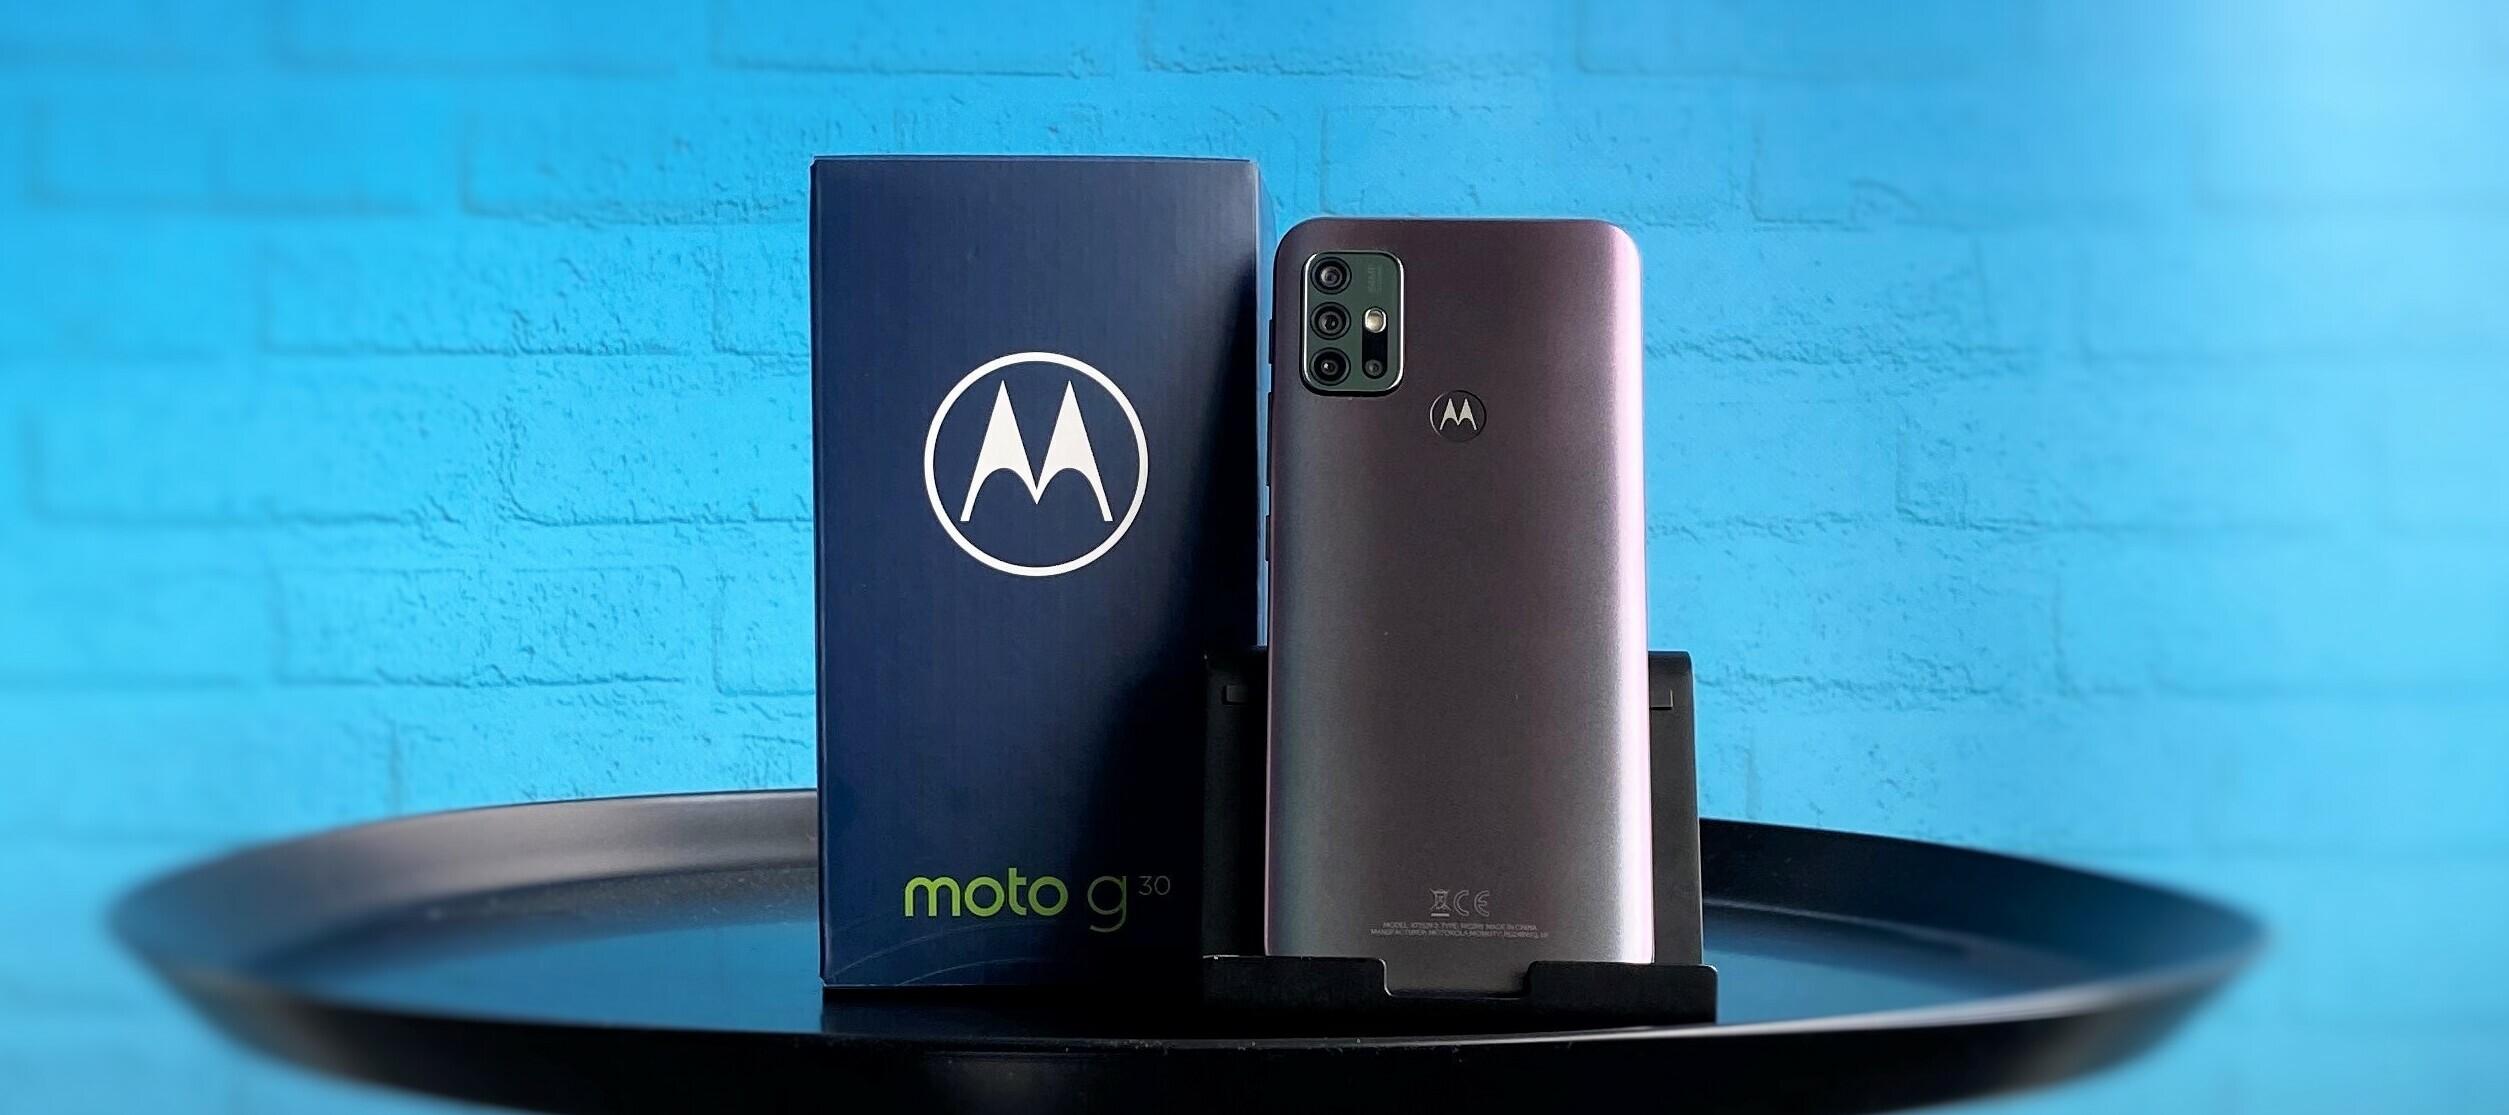 Motorola moto g30 - teste den günstigen Alleskönner!